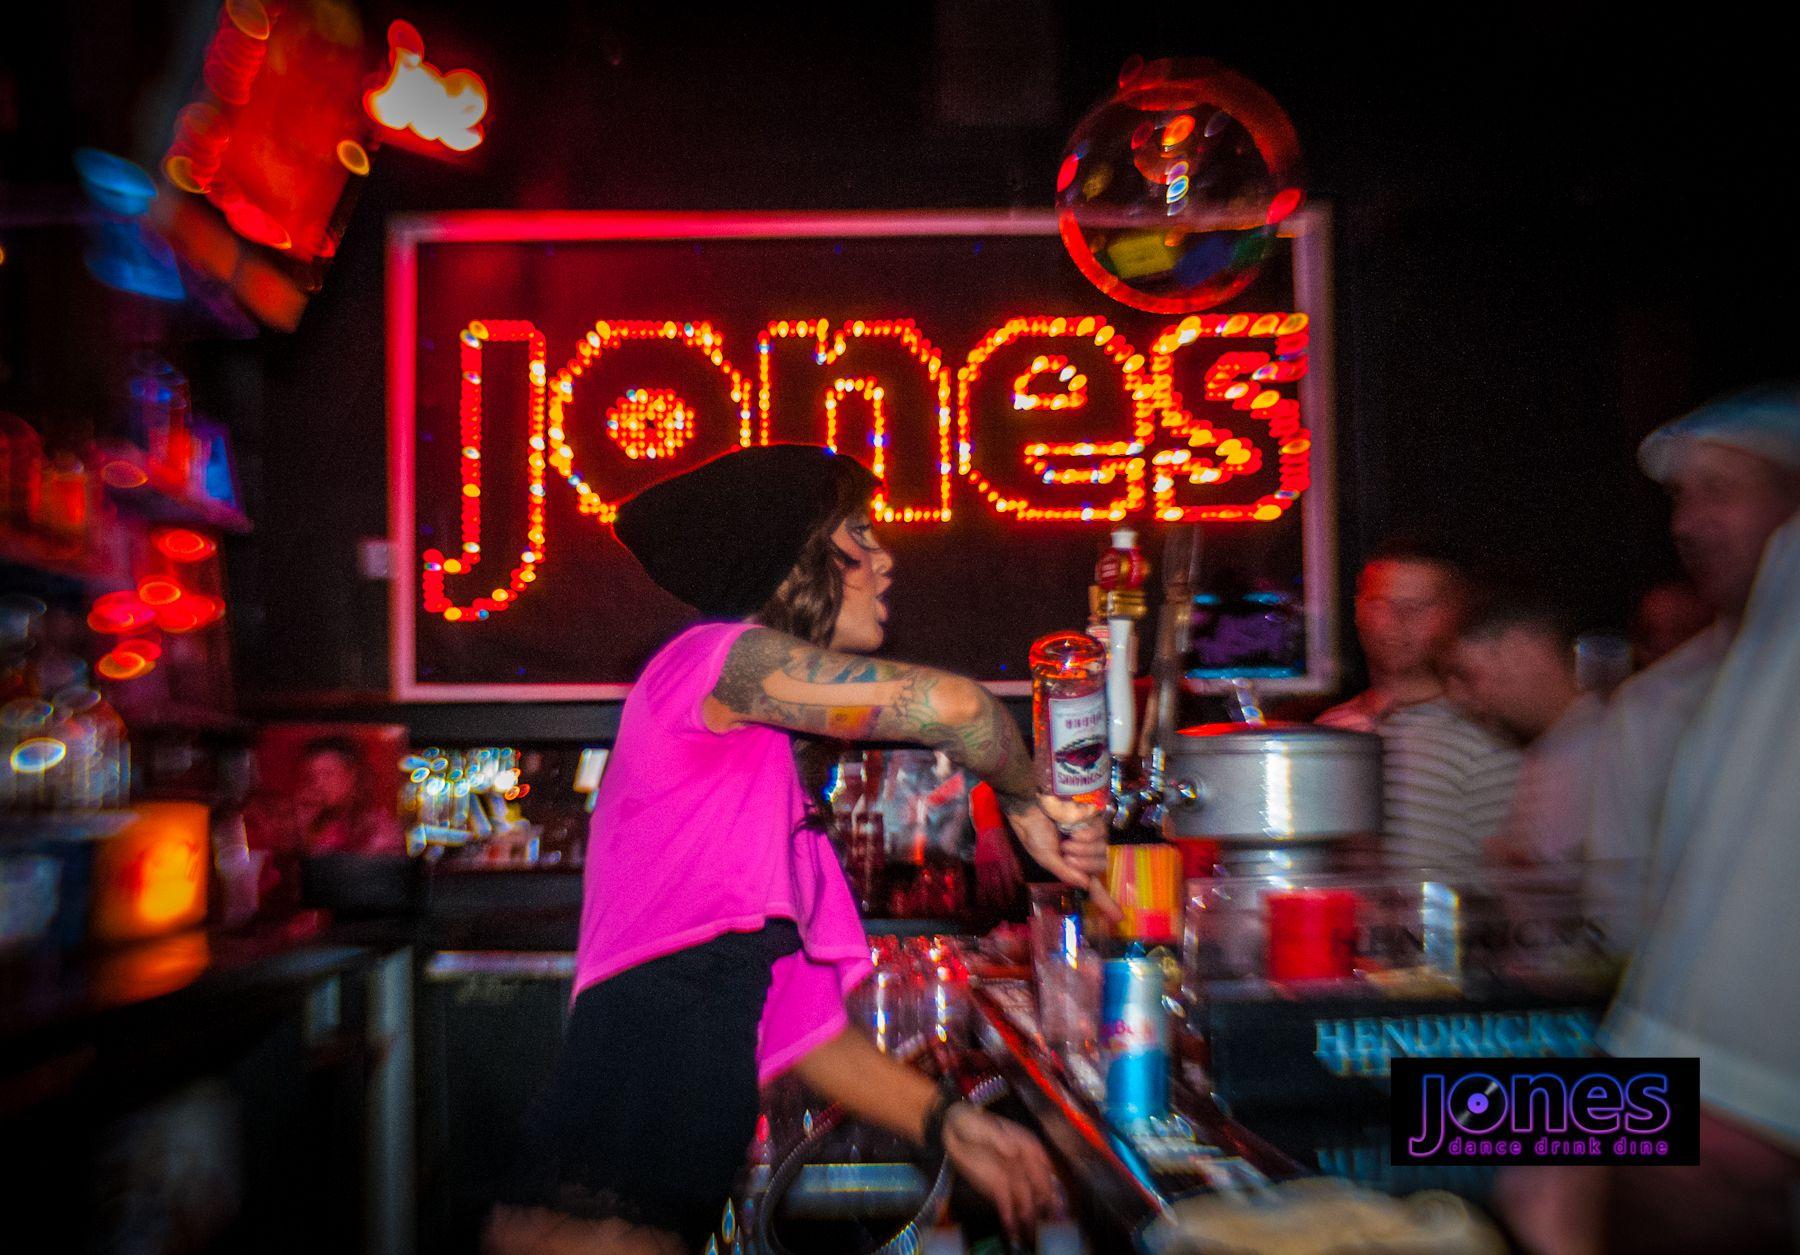 Hoddick_Photography_Jones_20120330-52